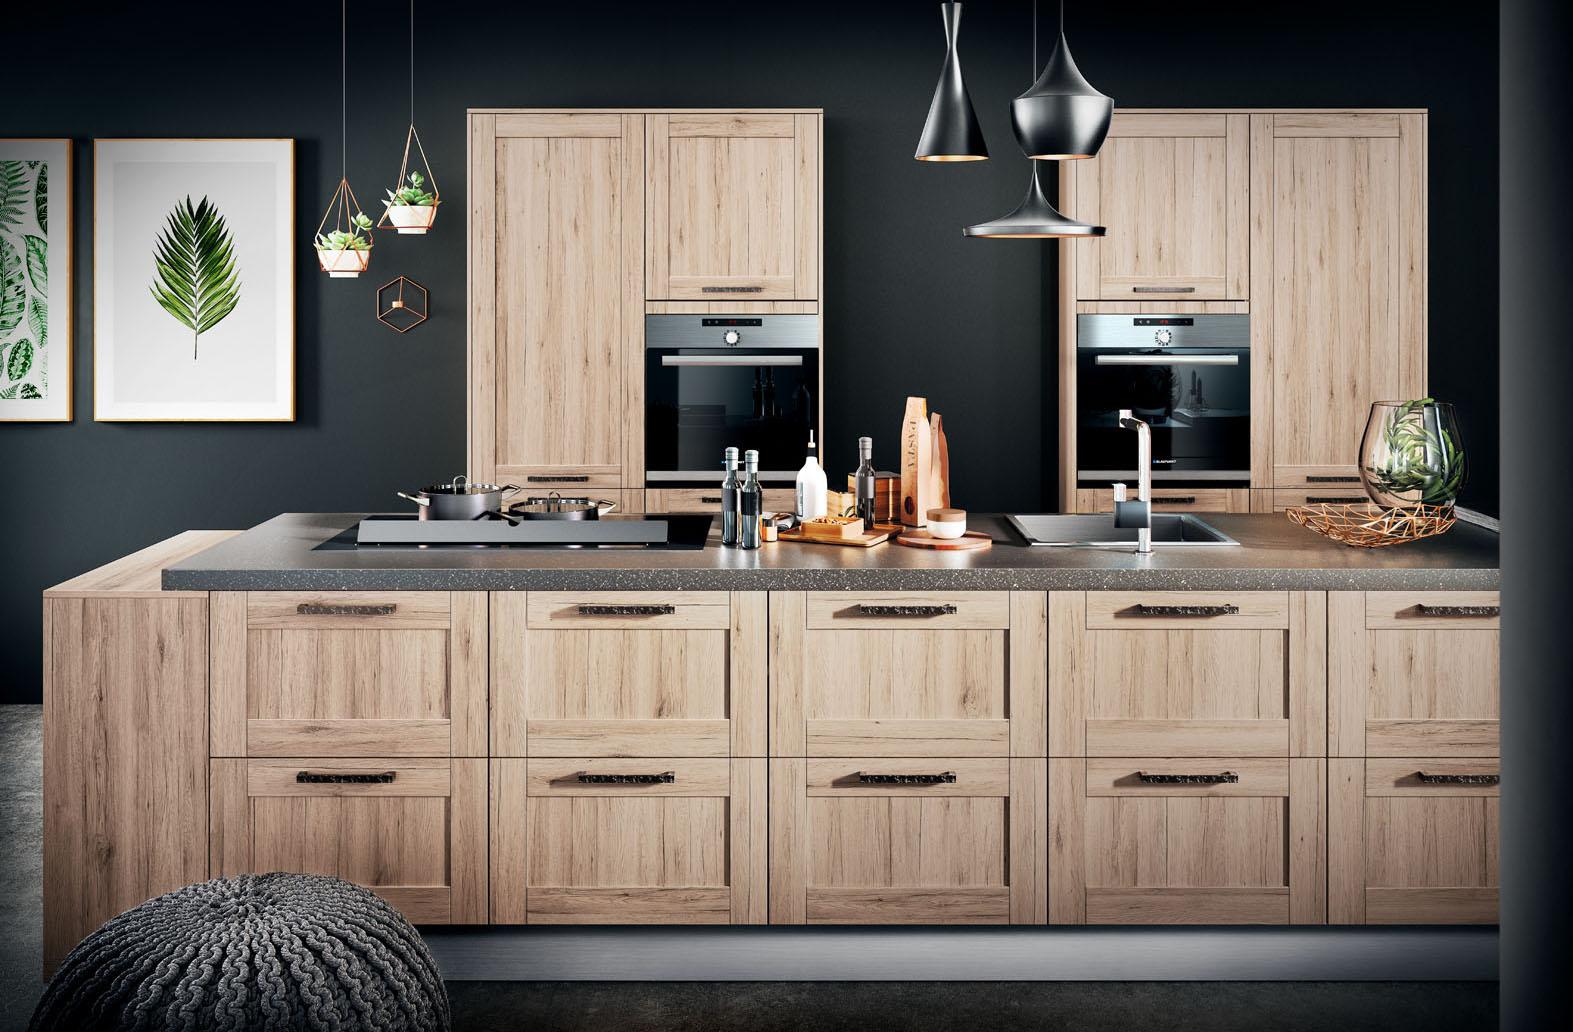 Stoere Keuken Wood : Oldwood keukens de nieuwe trend in keukens